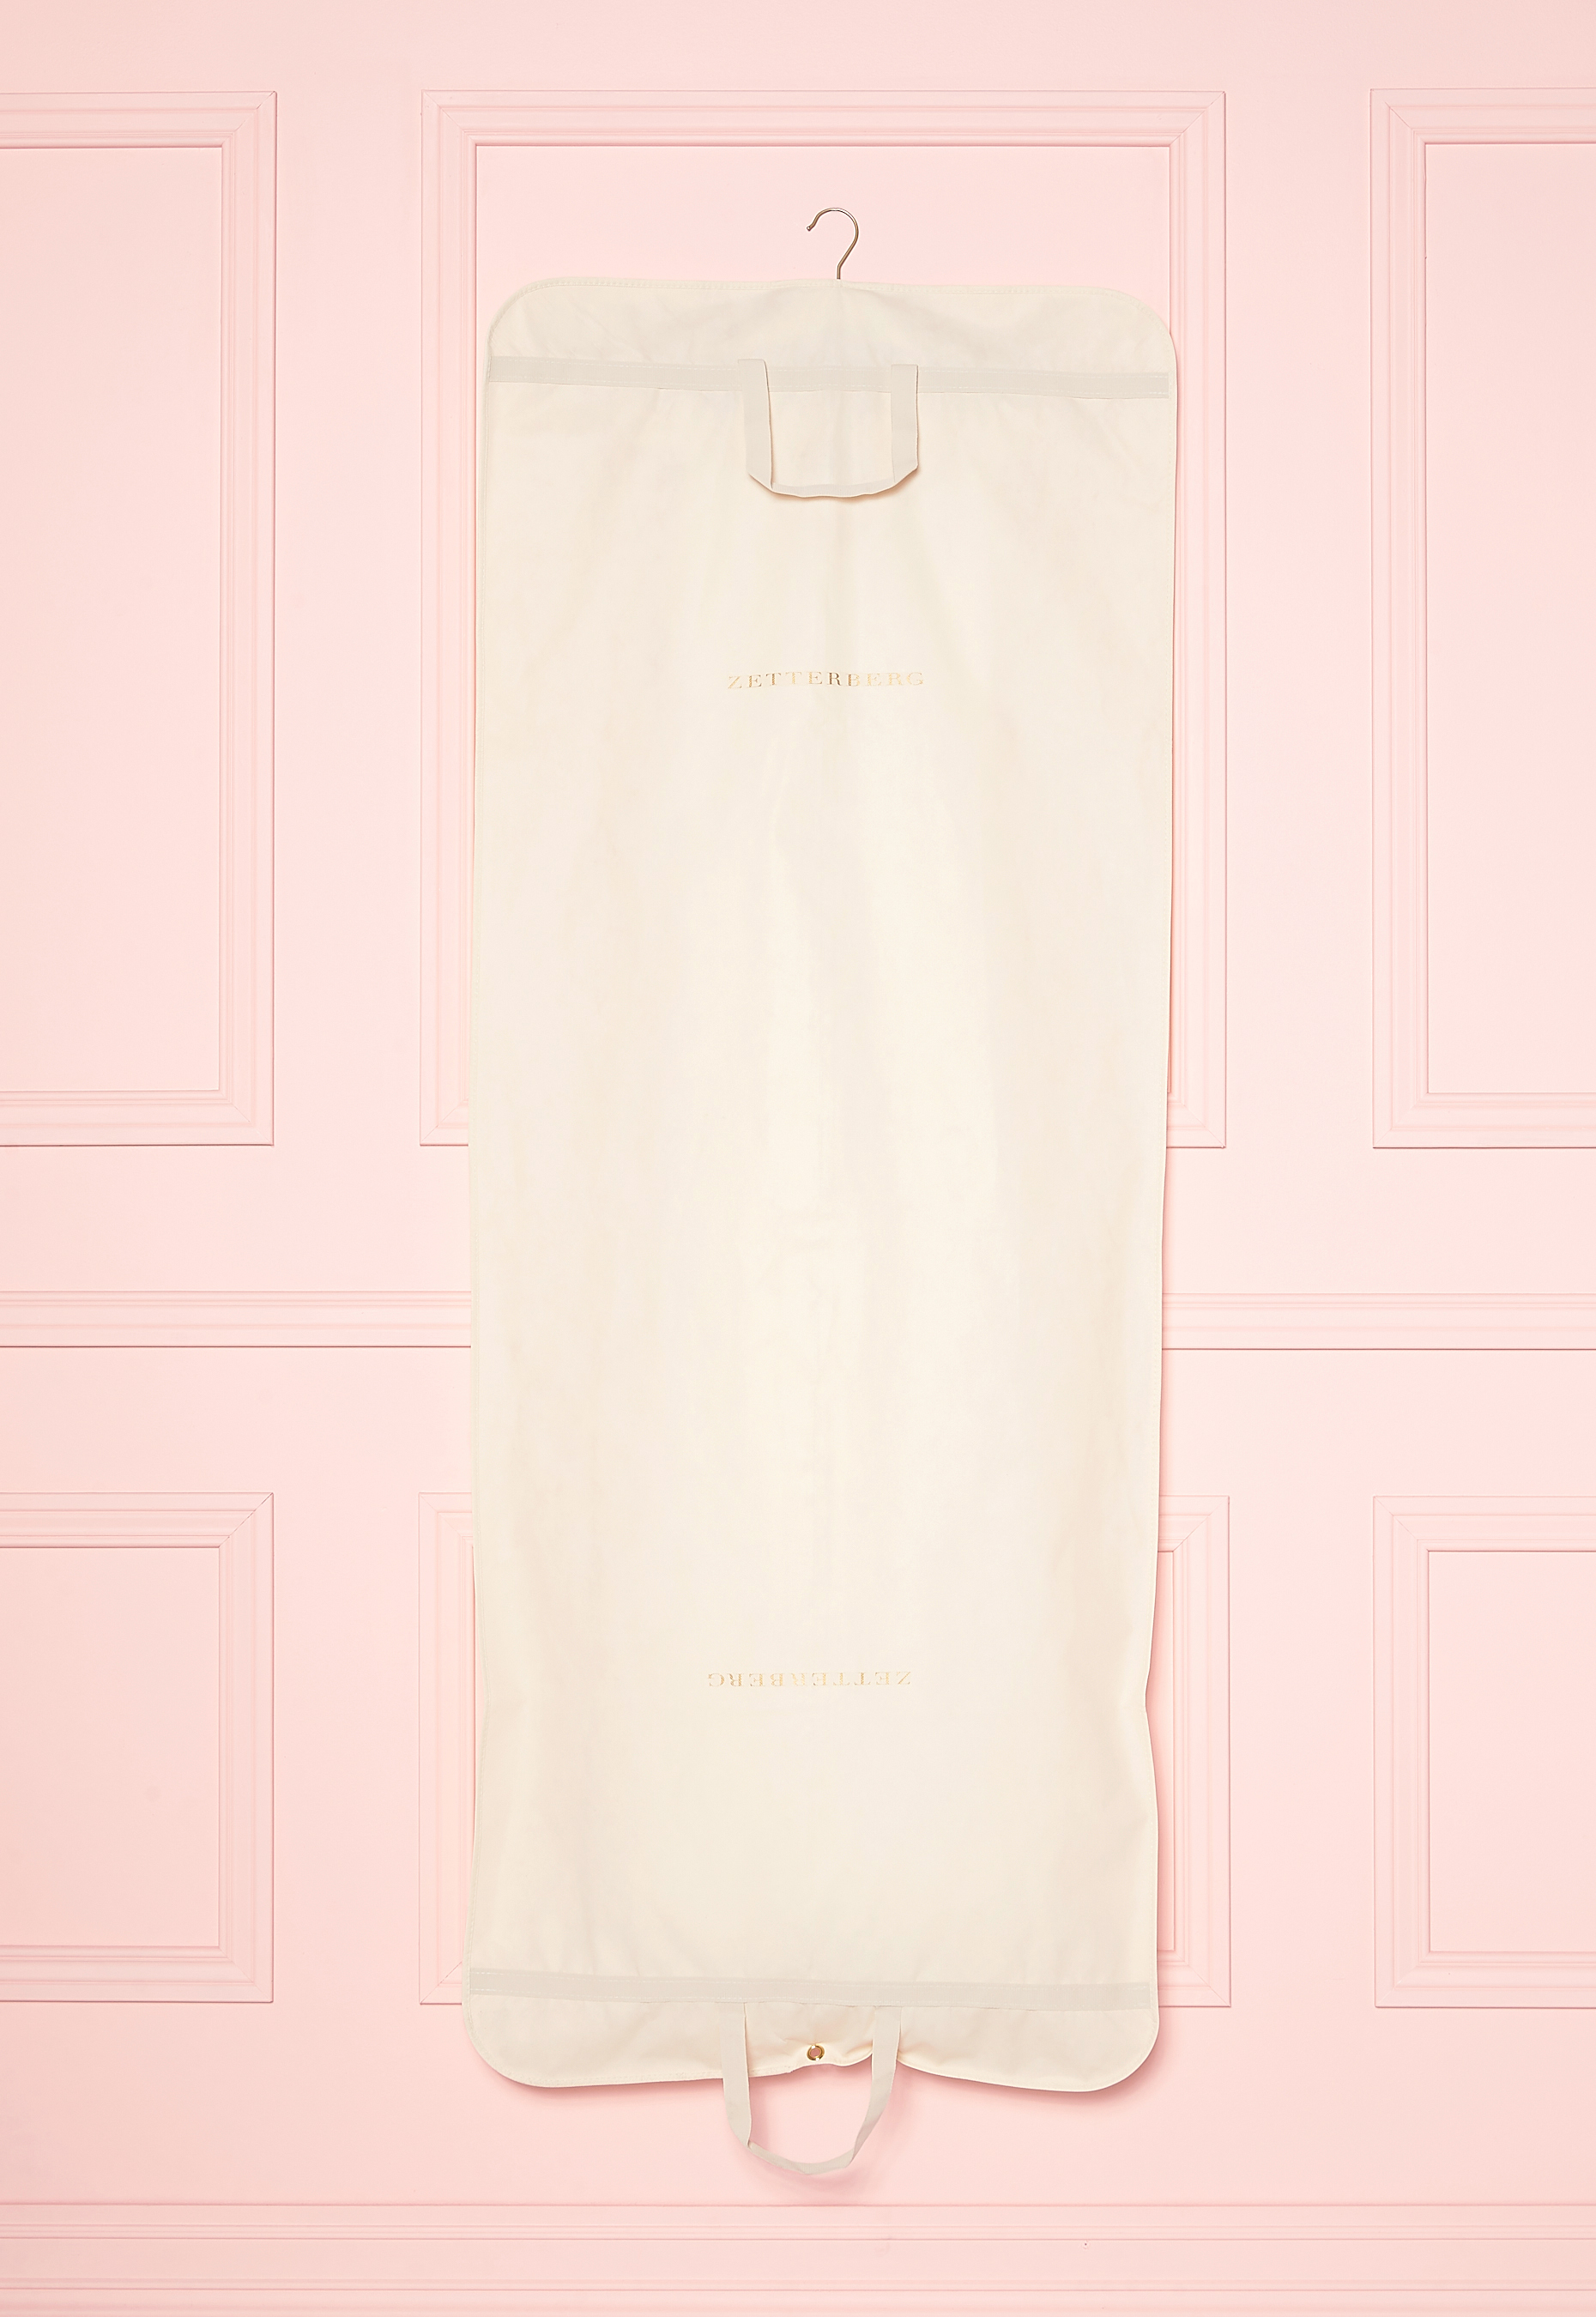 b4020768 Zetterberg Couture Stella Dress Ivory/Nude - Bubbleroom